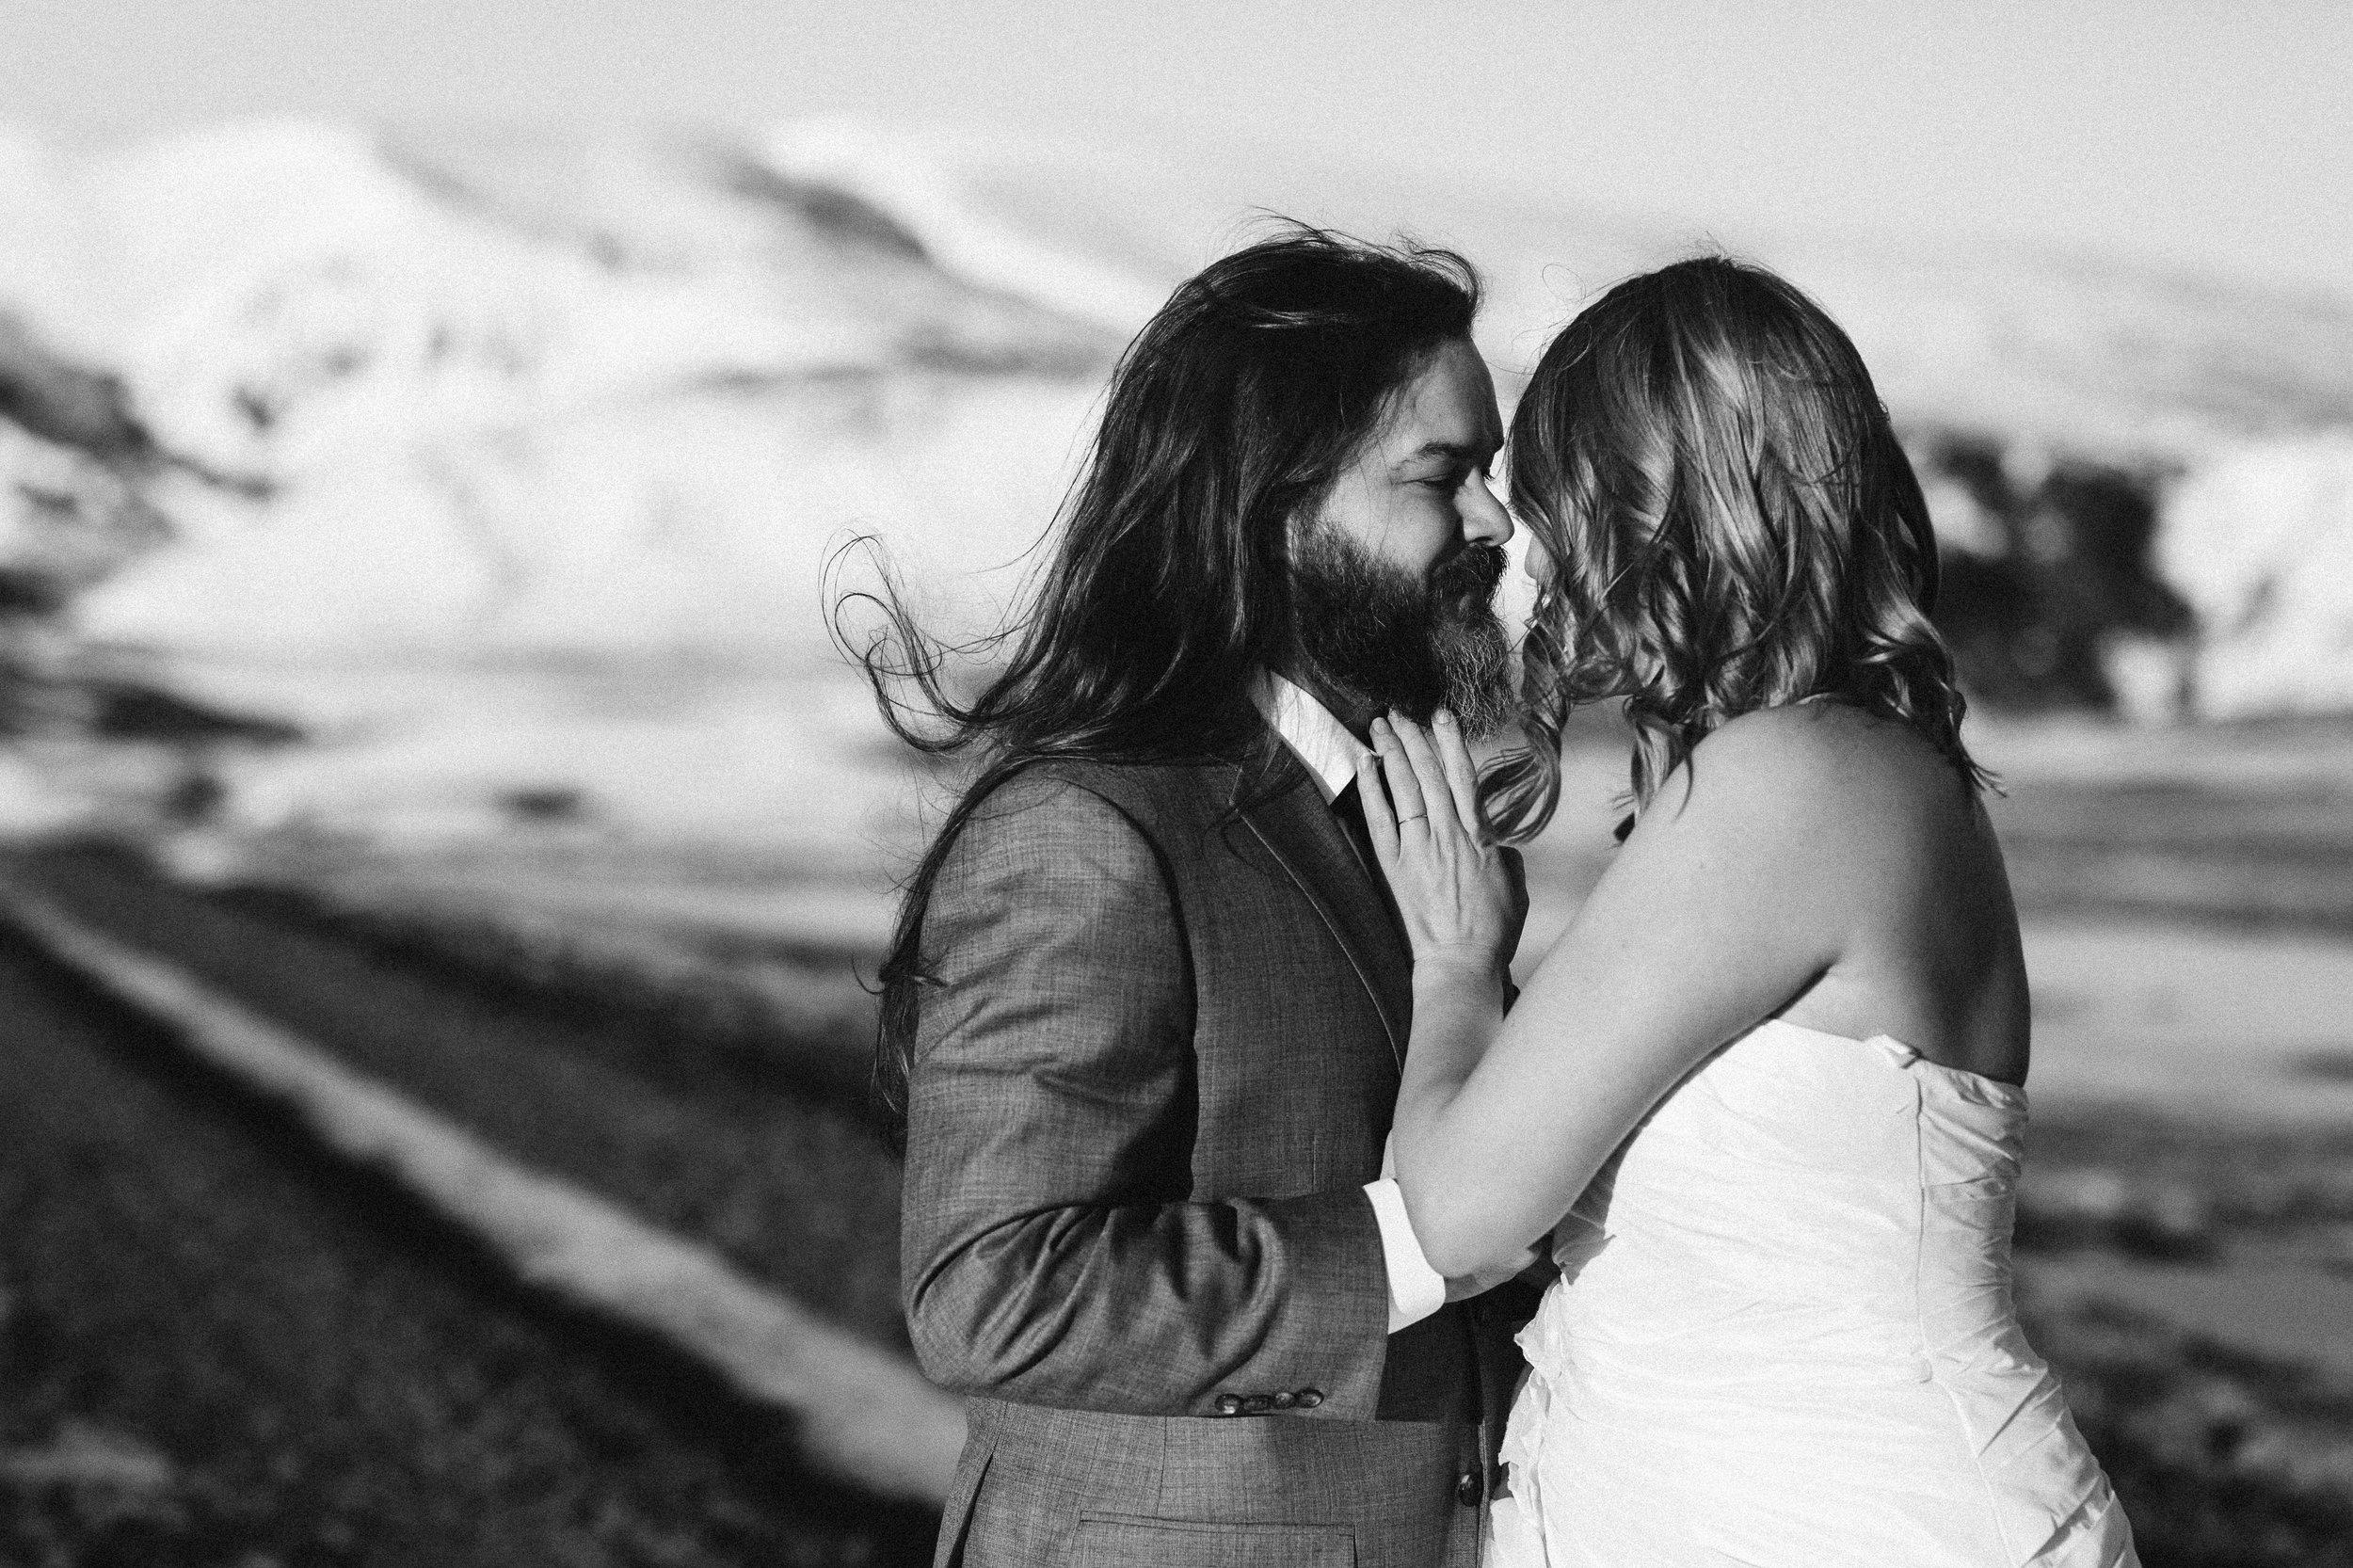 nicole-daacke-photography-iceland-winter-sunset-adventure-elopement-skogafoss-waterfall-black-sand-beach-dyrholaey-vik-iceland-intimate-wedding-black-church-elopement-photographer-19.jpg